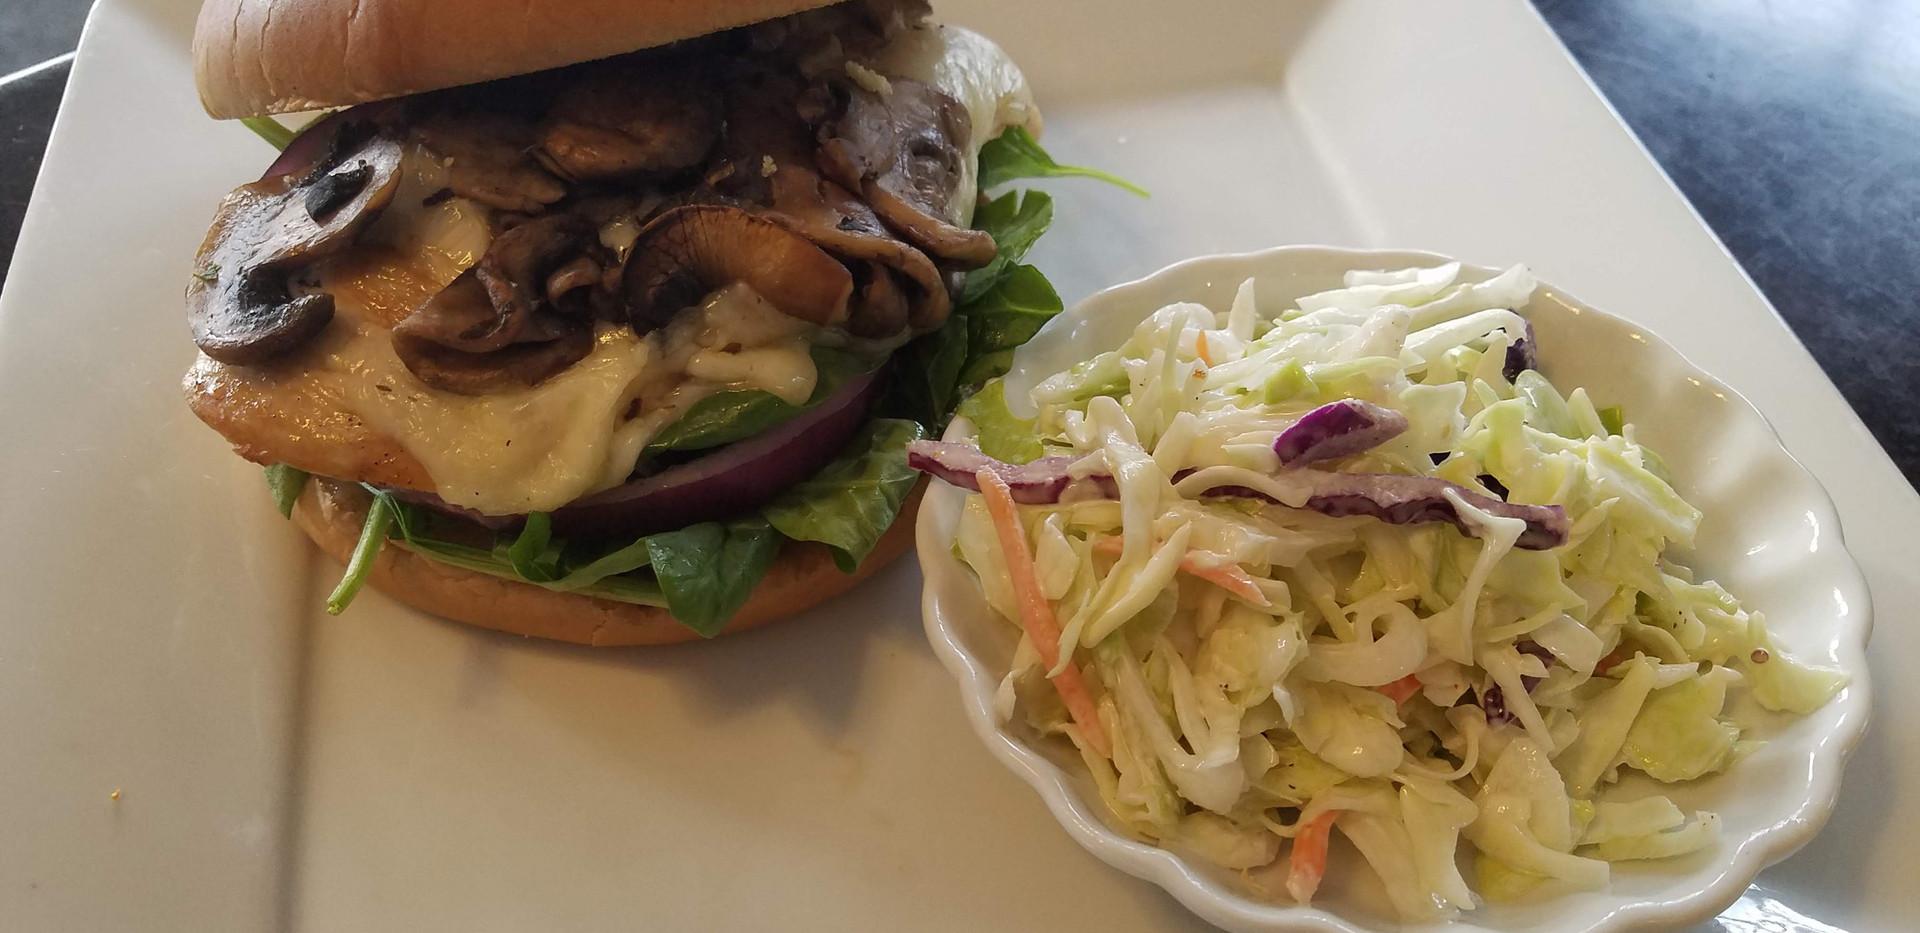 ChickenMushroomSwiss Sandwich.jpg